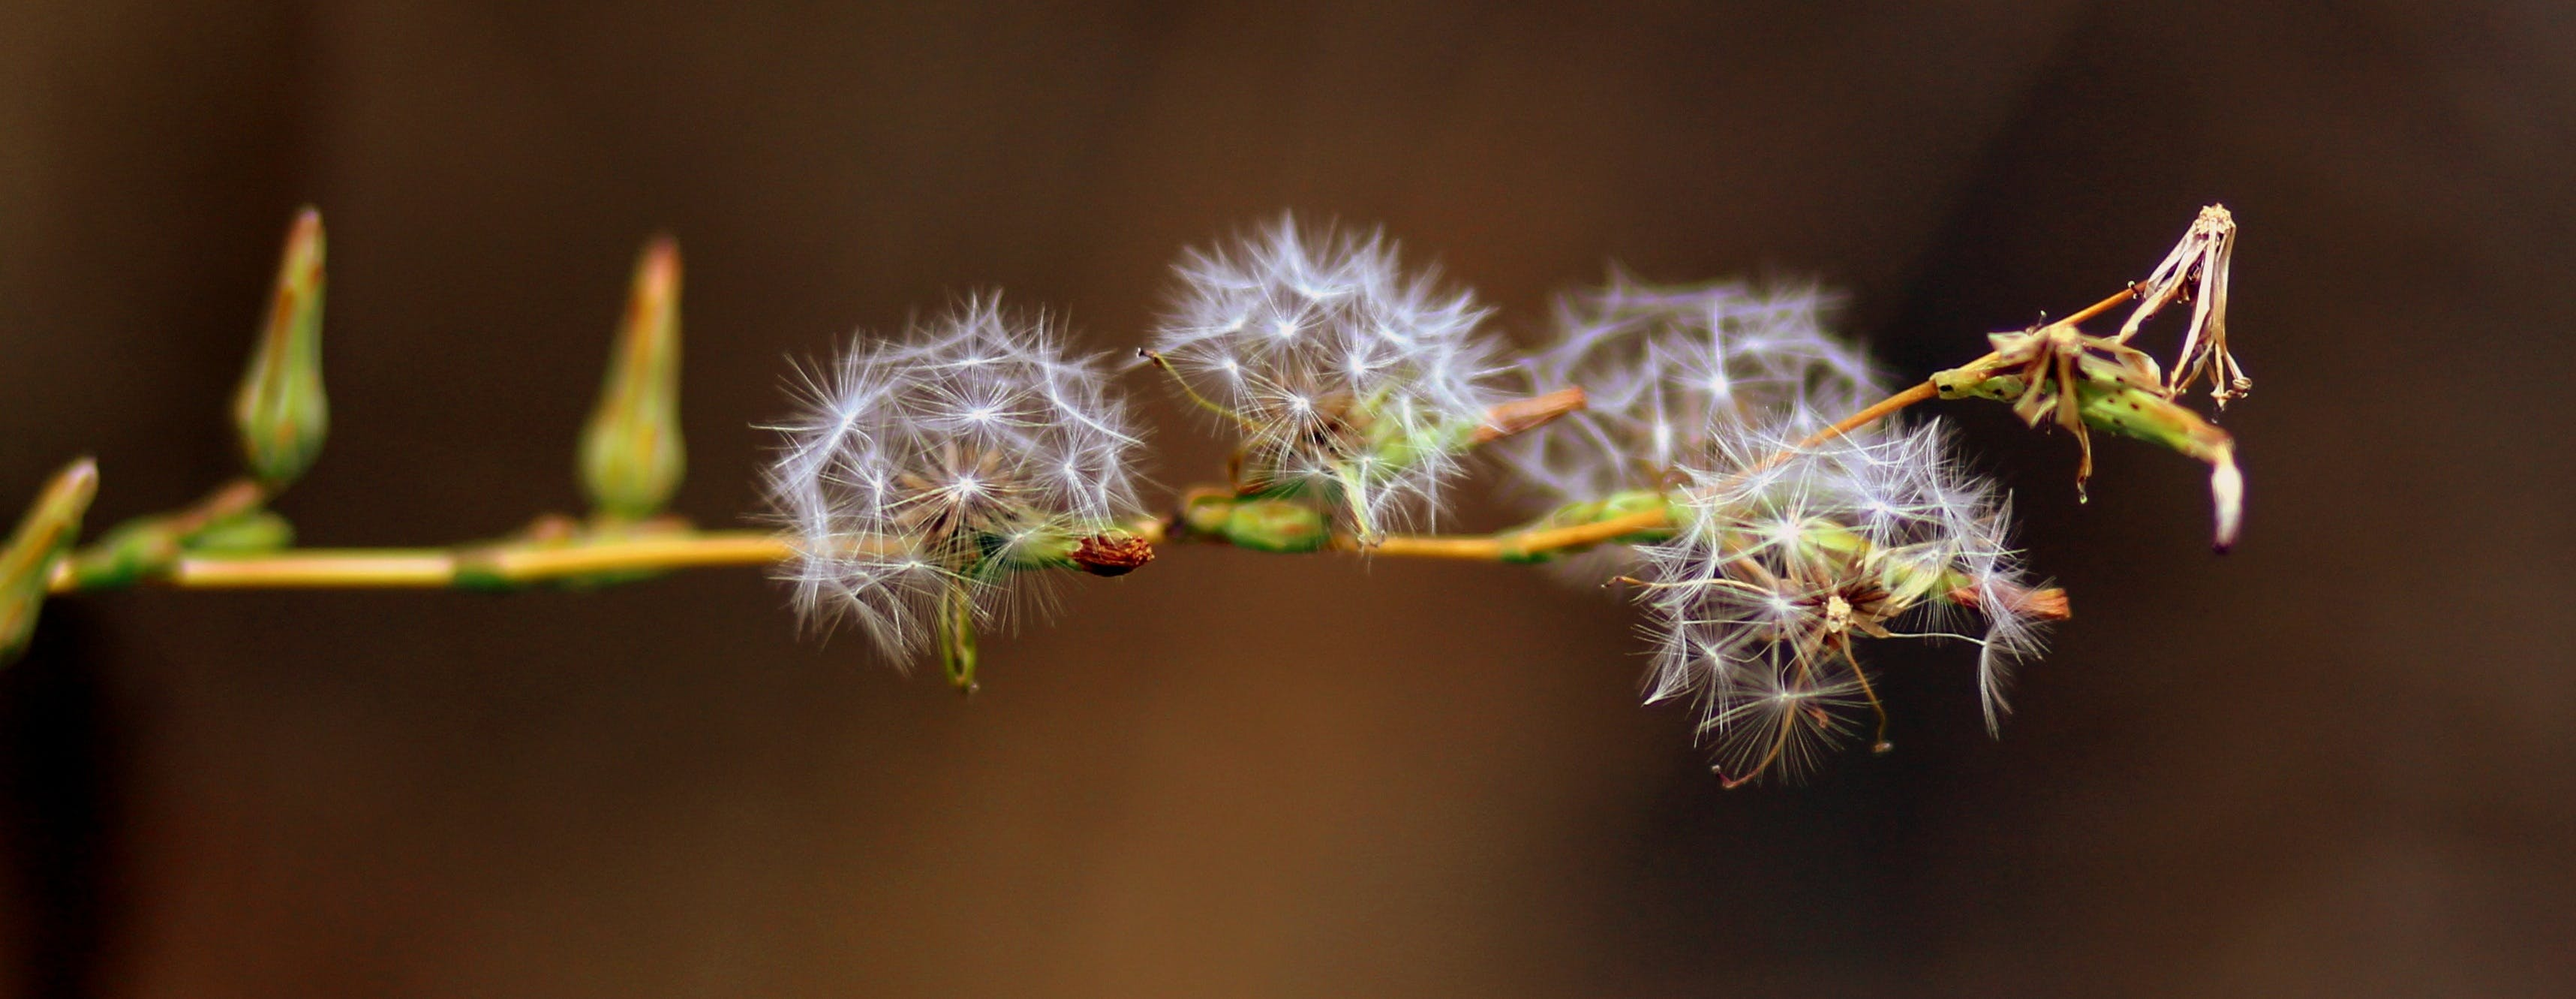 Free stock photo of nature, plant, dandelion, down